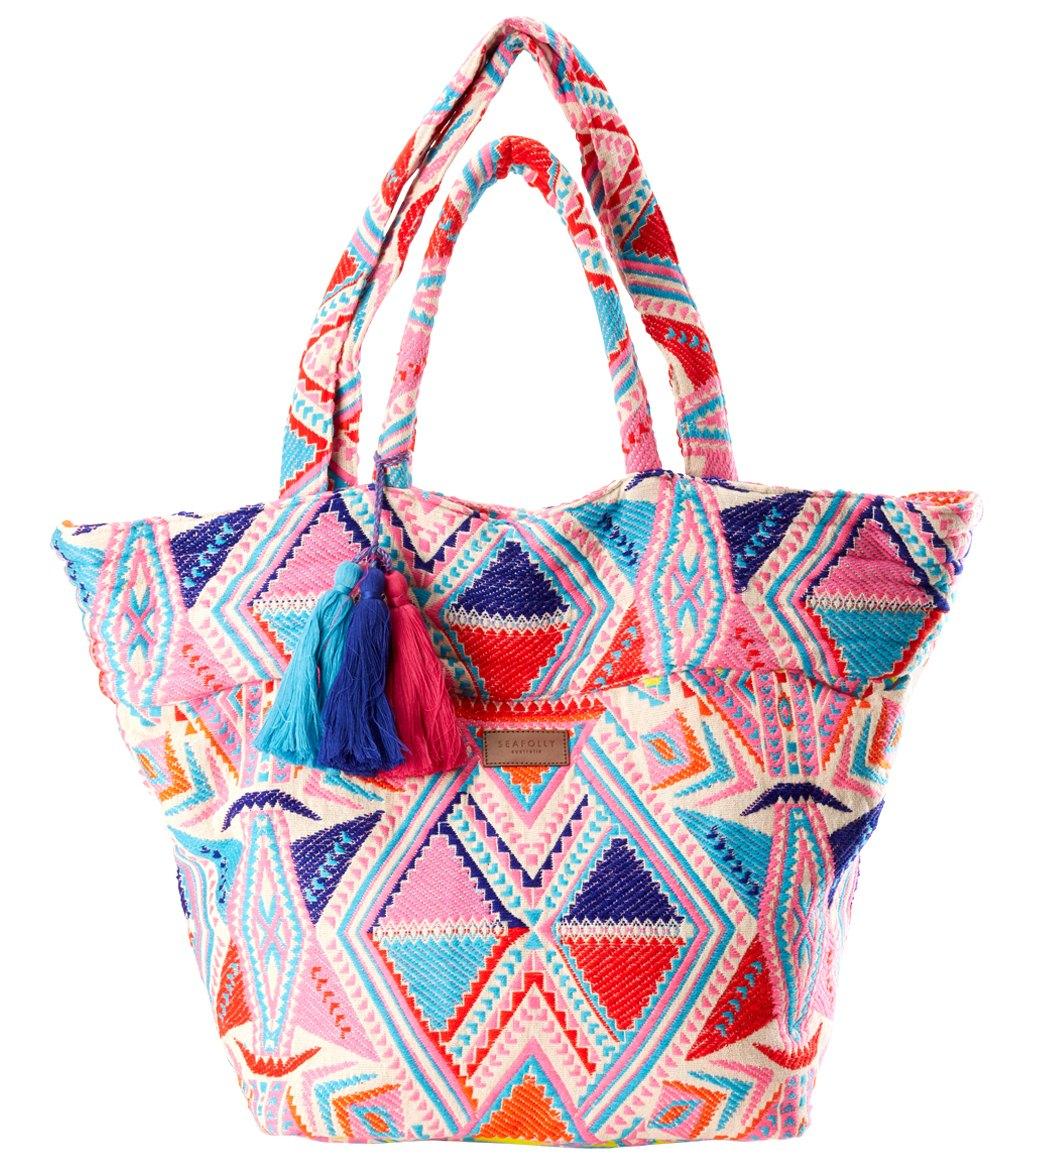 Oversized Beach Bag Share